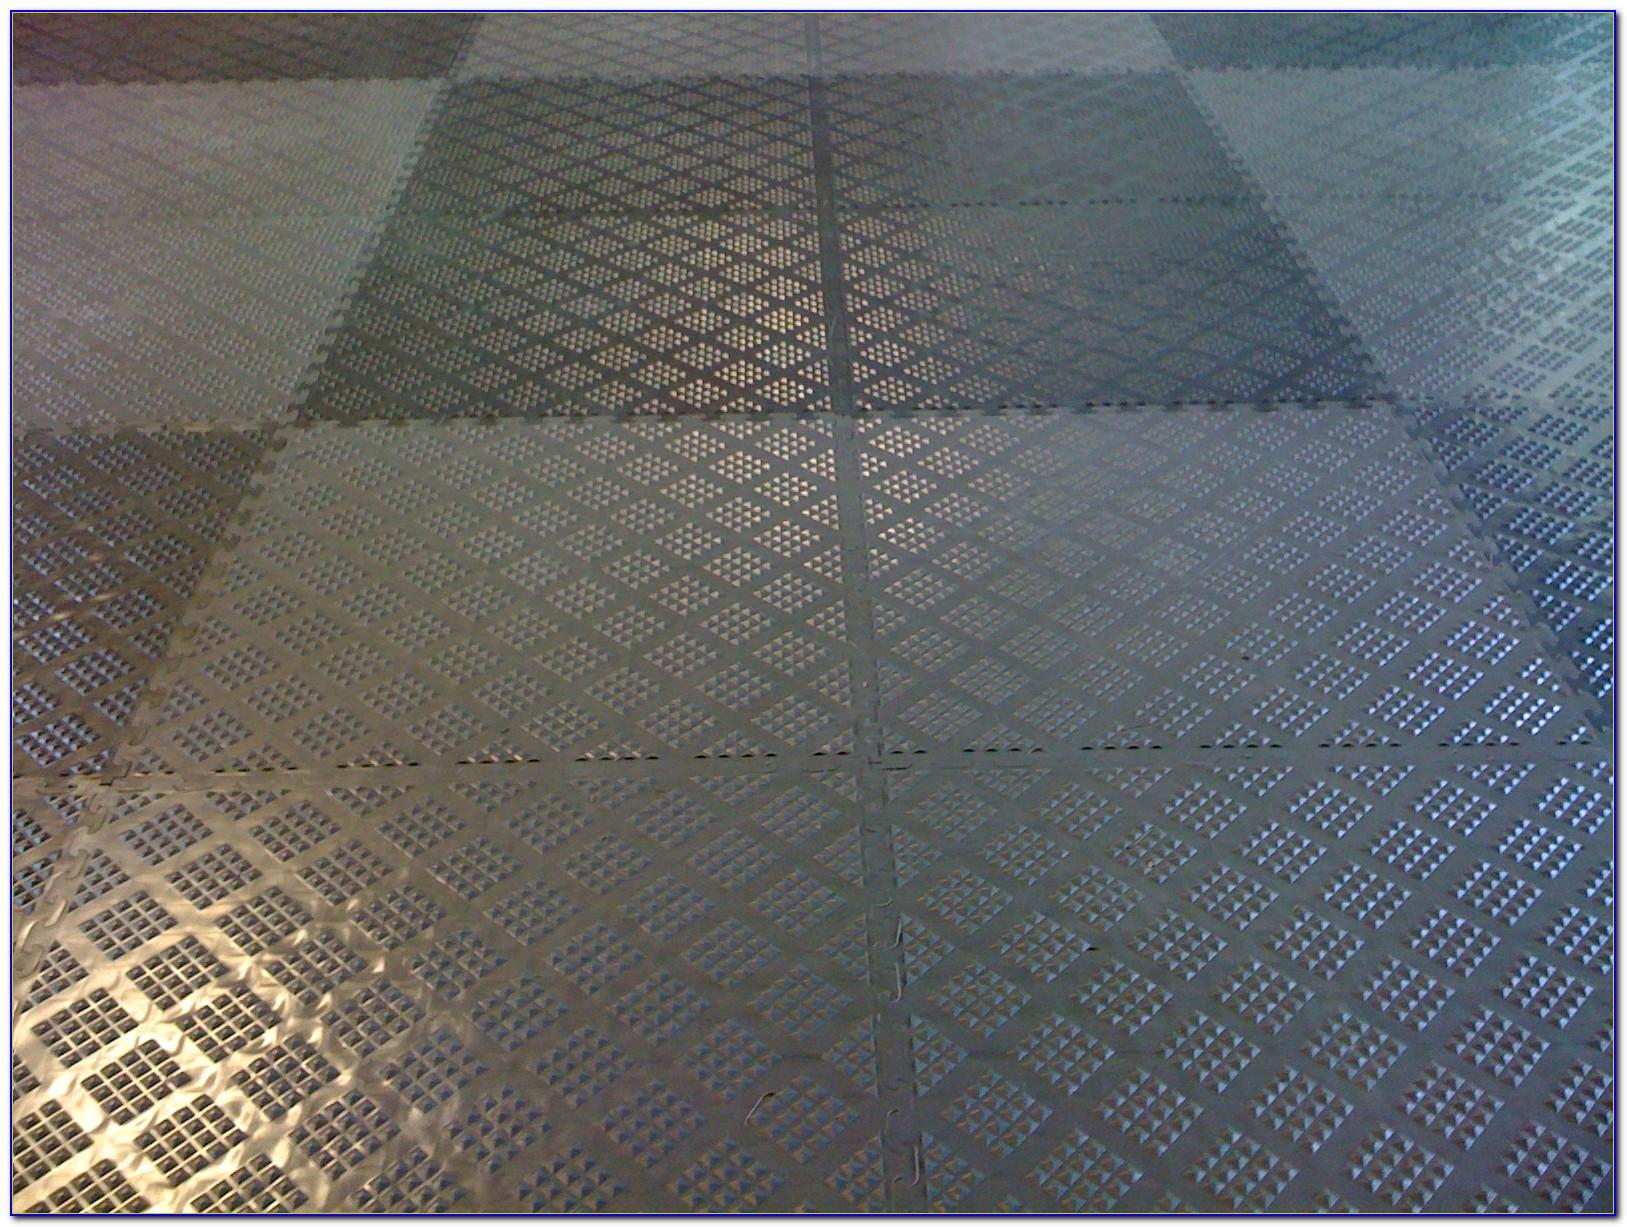 interlocking garage floor tiles australia tiles home design ideas a5pjjazp9l67944. Black Bedroom Furniture Sets. Home Design Ideas